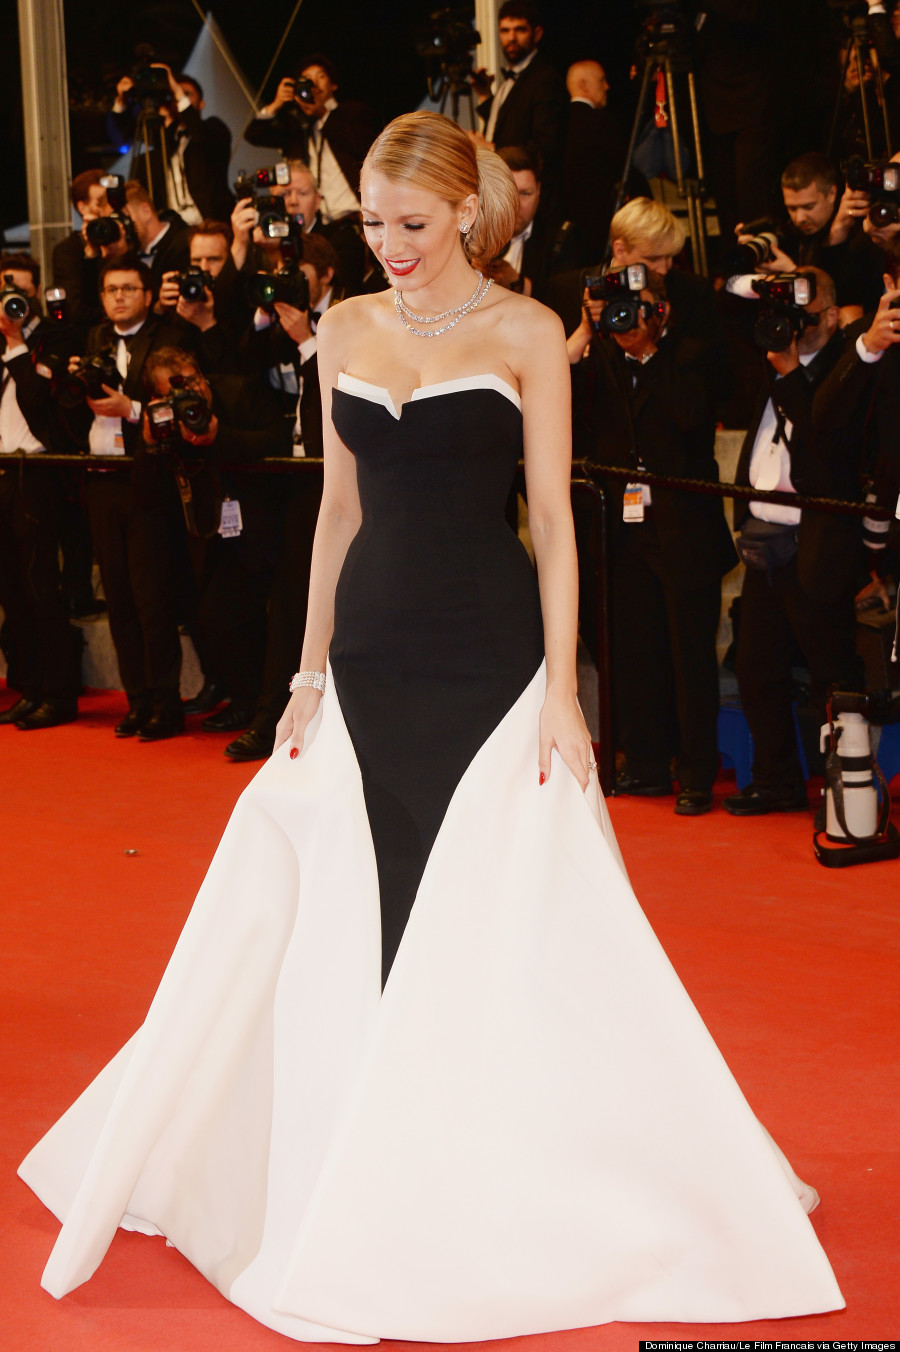 Blake Lively Channels Julia Roberts Oscar Dress At 2014